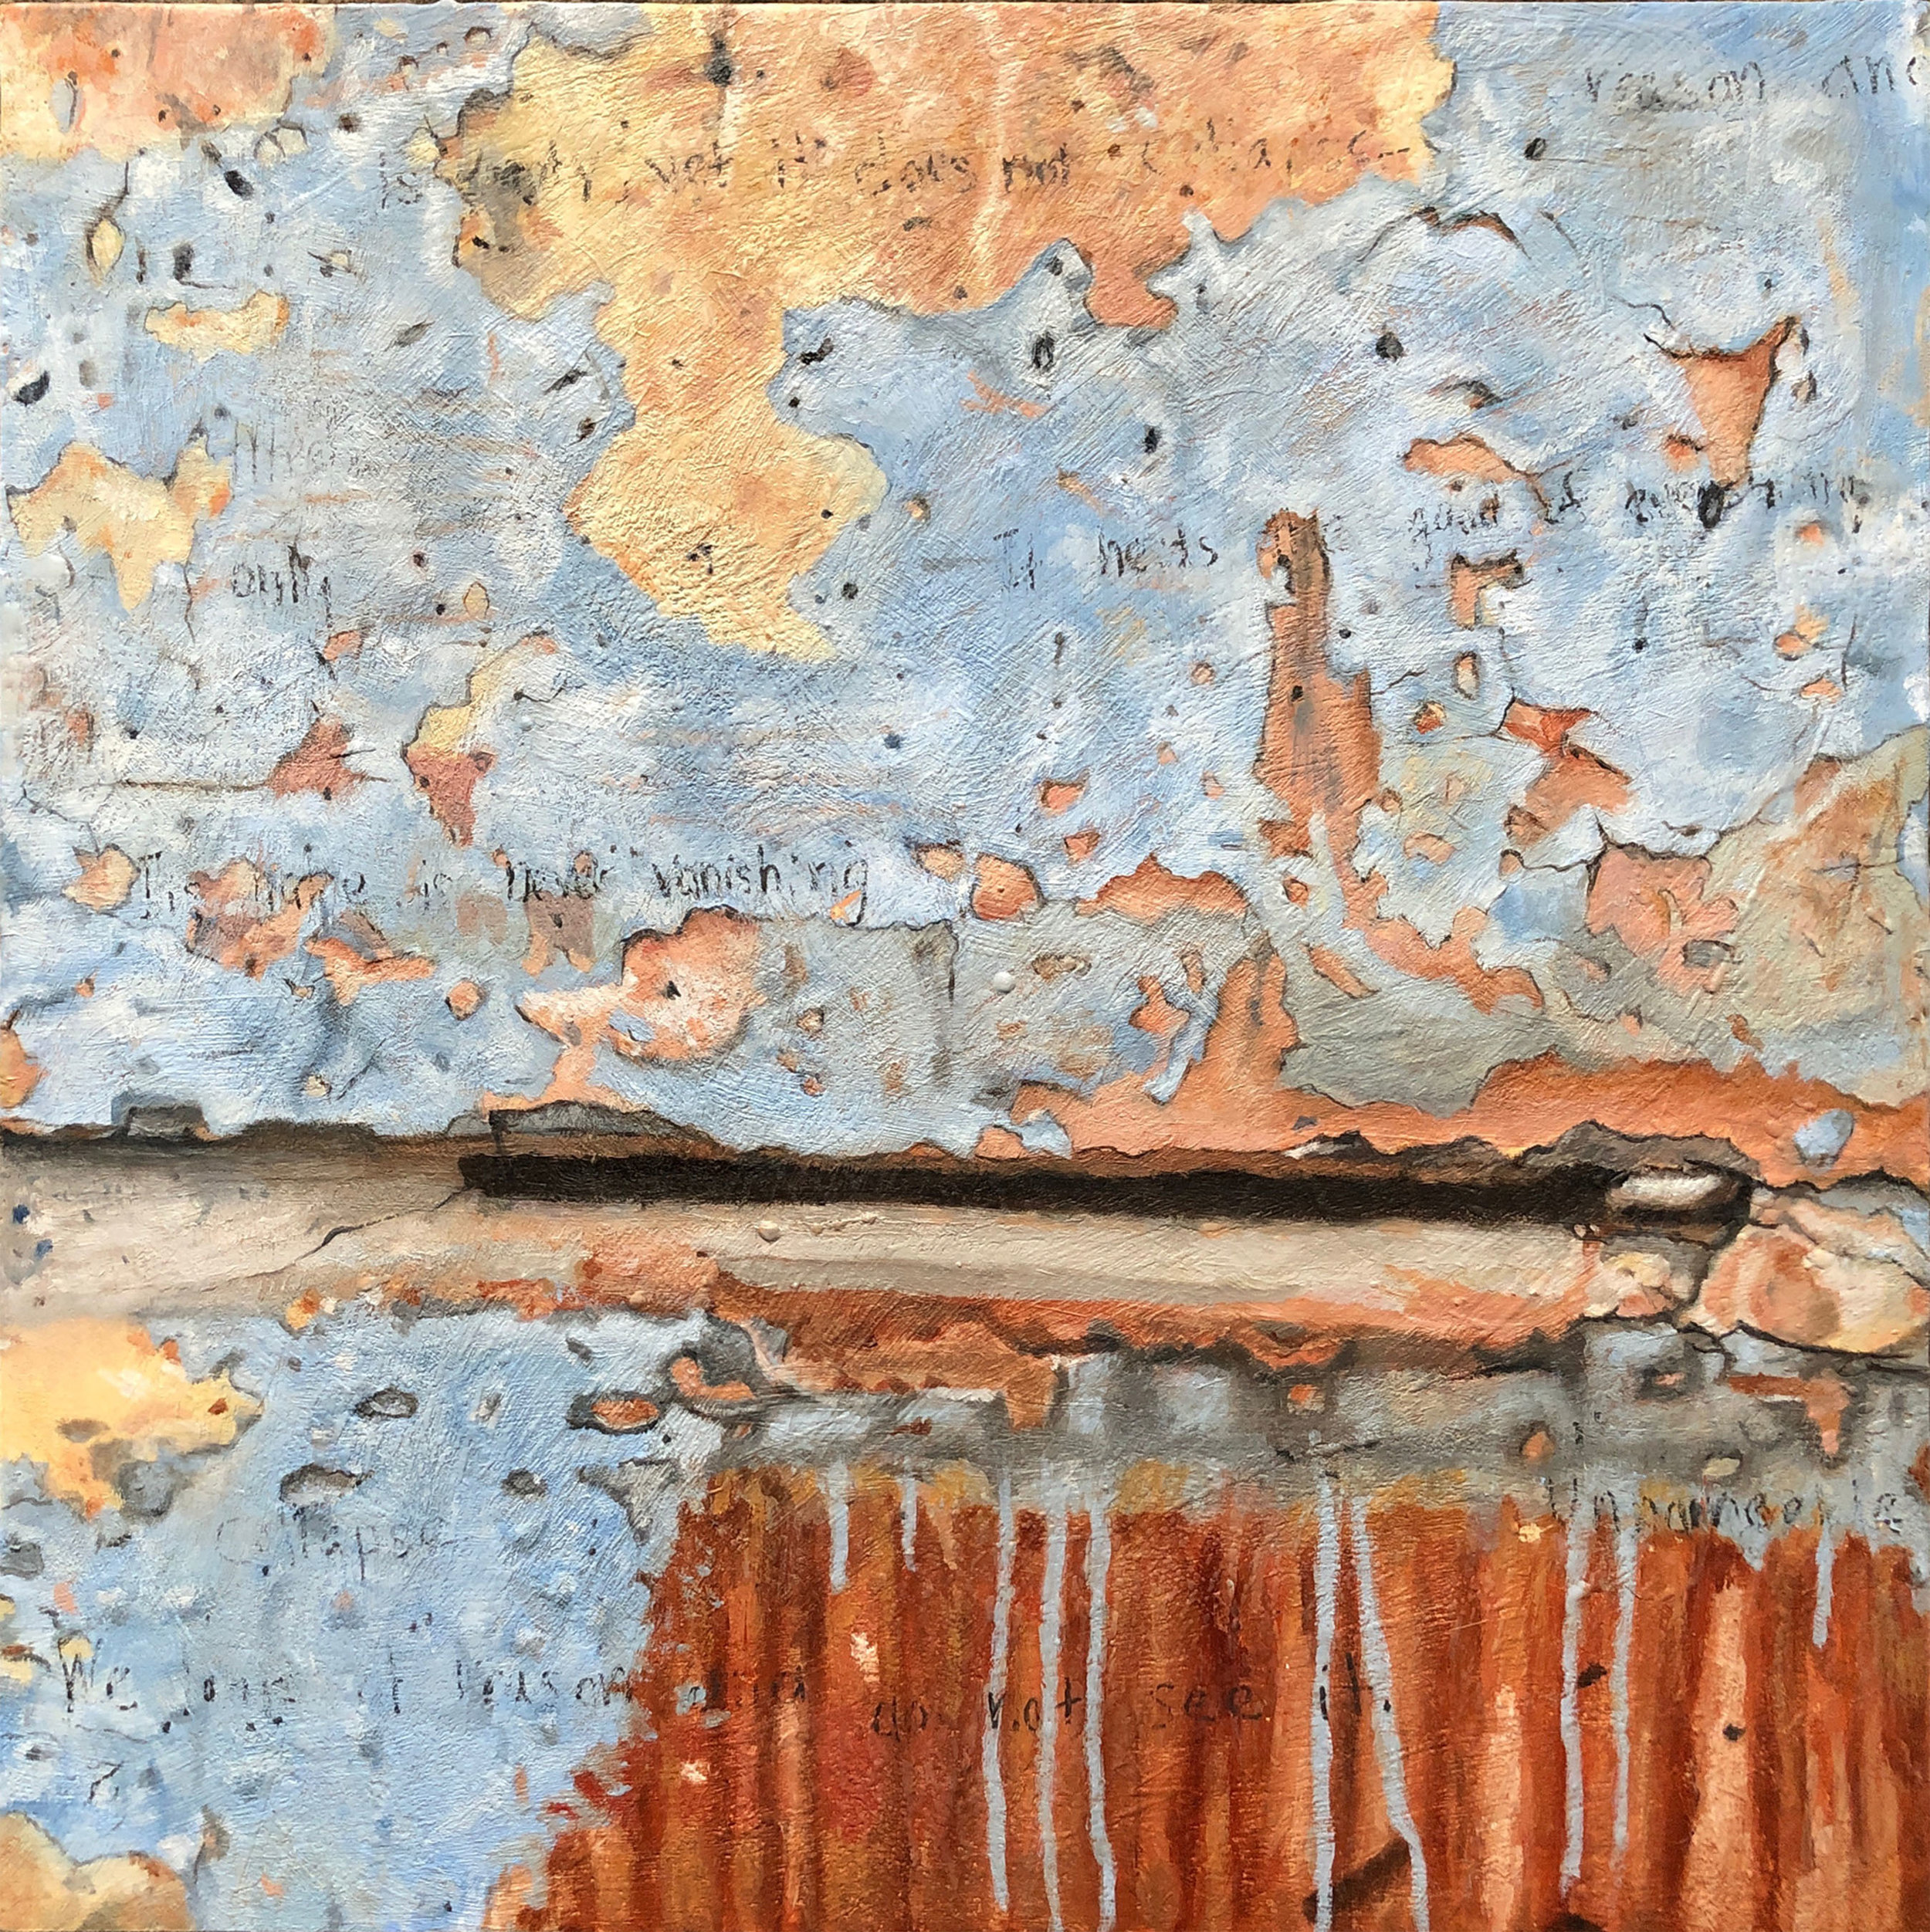 Tracy Spadafora,  Never Vanishing , Encaustic and oil on wood  panel, 24x24